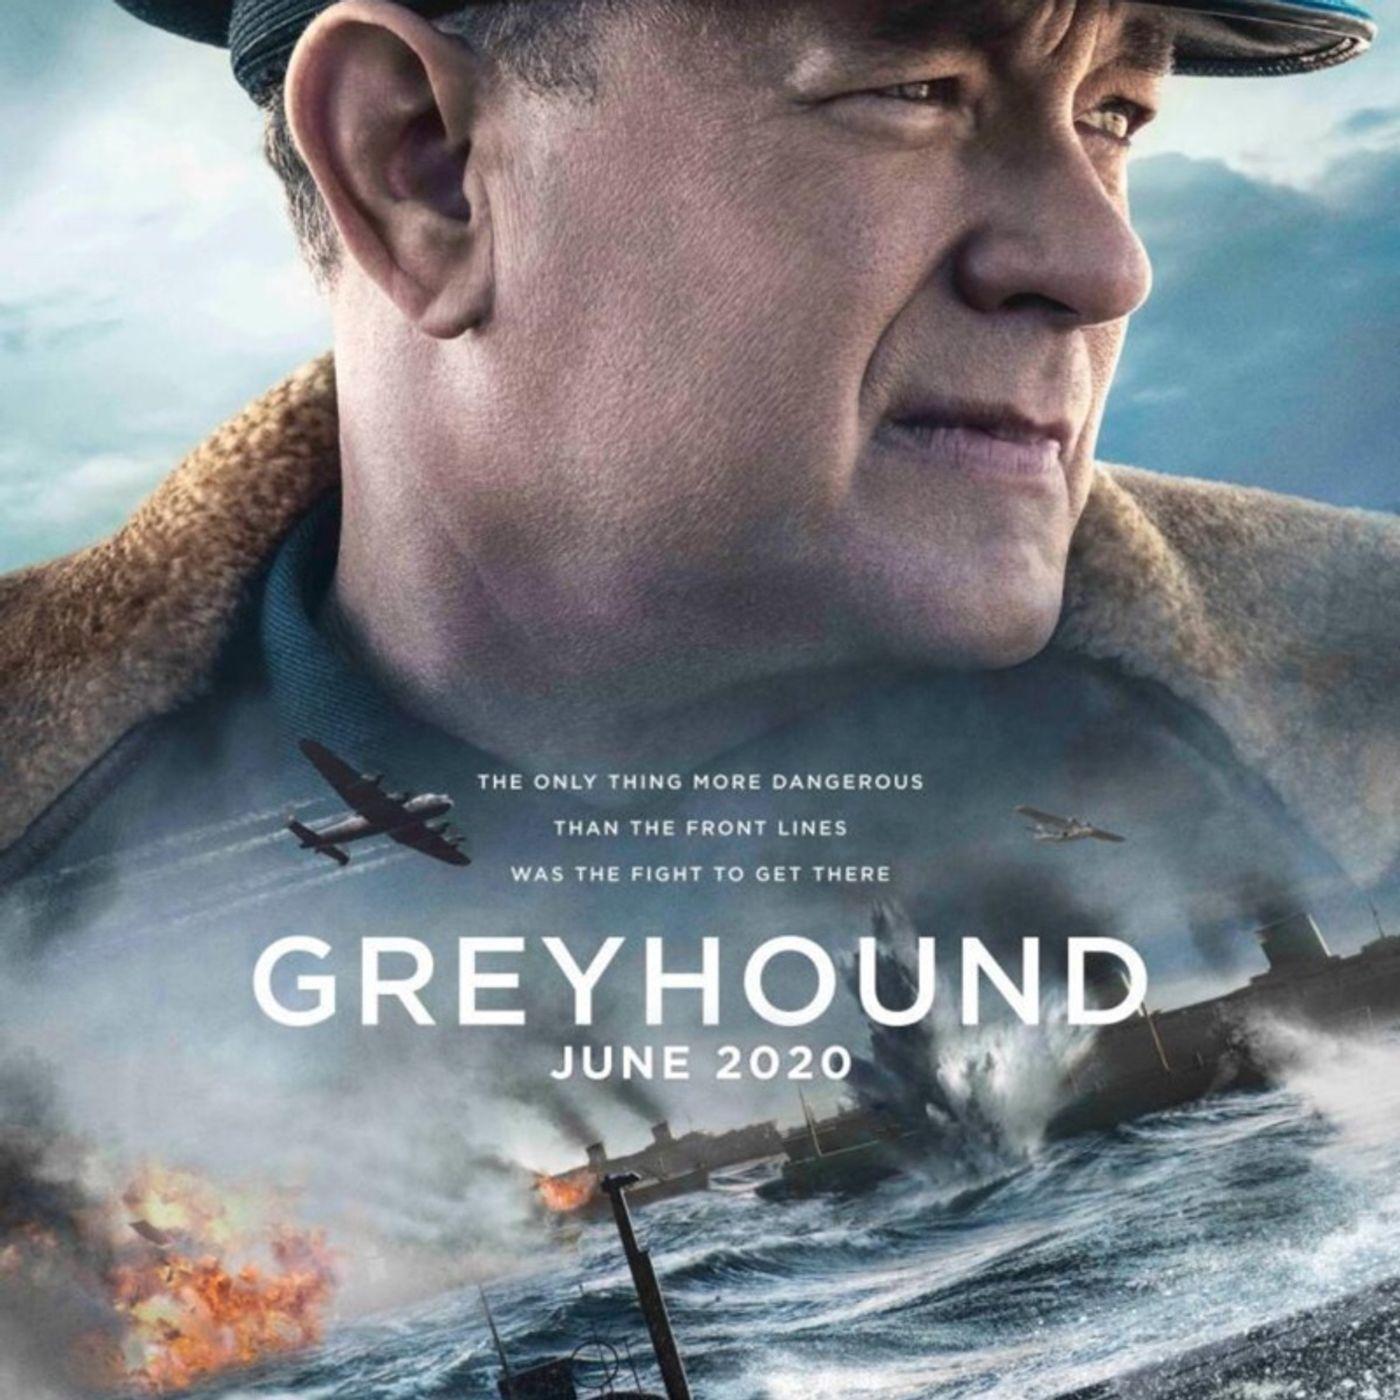 Greyhound the Movie and Prayer